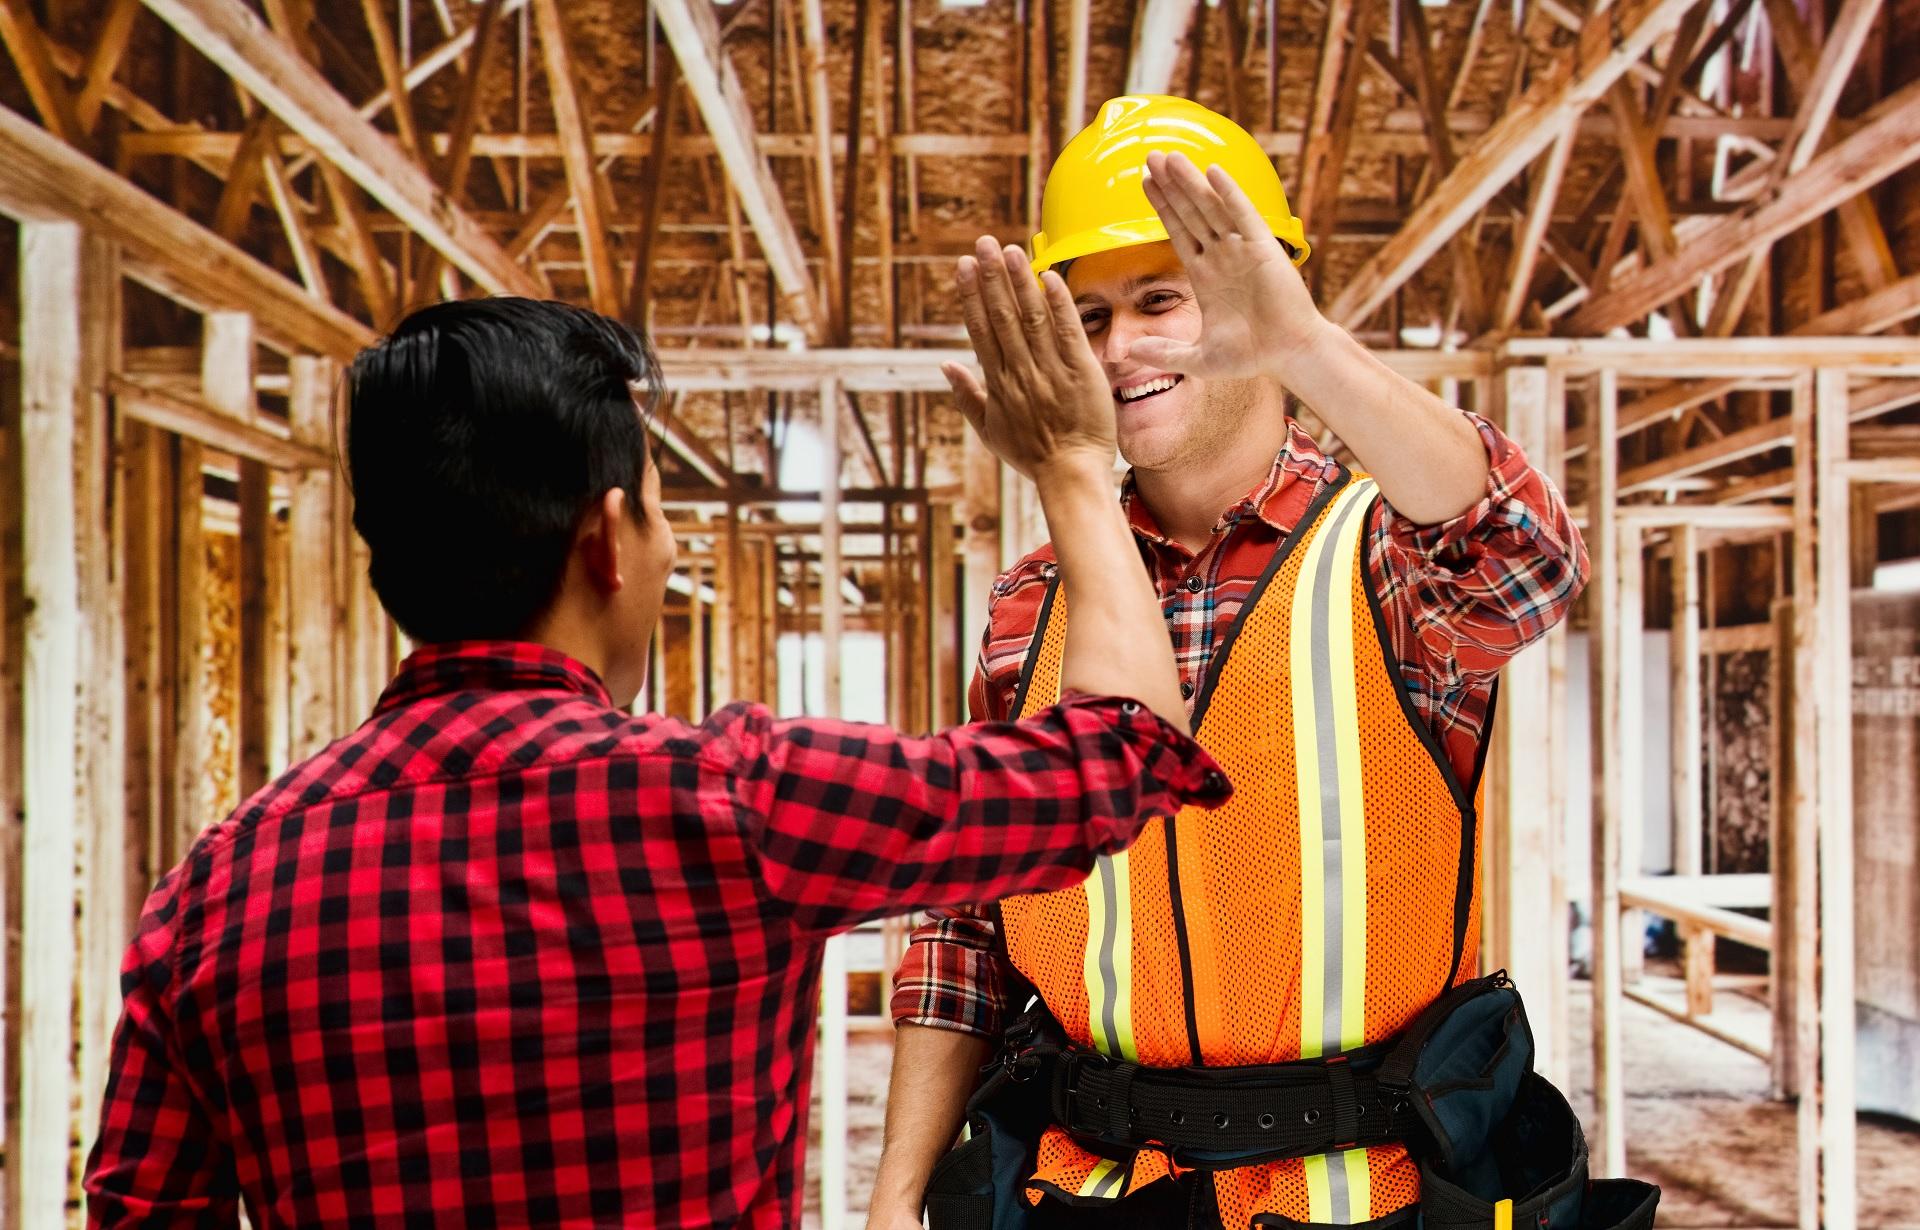 Mannen in de bouw